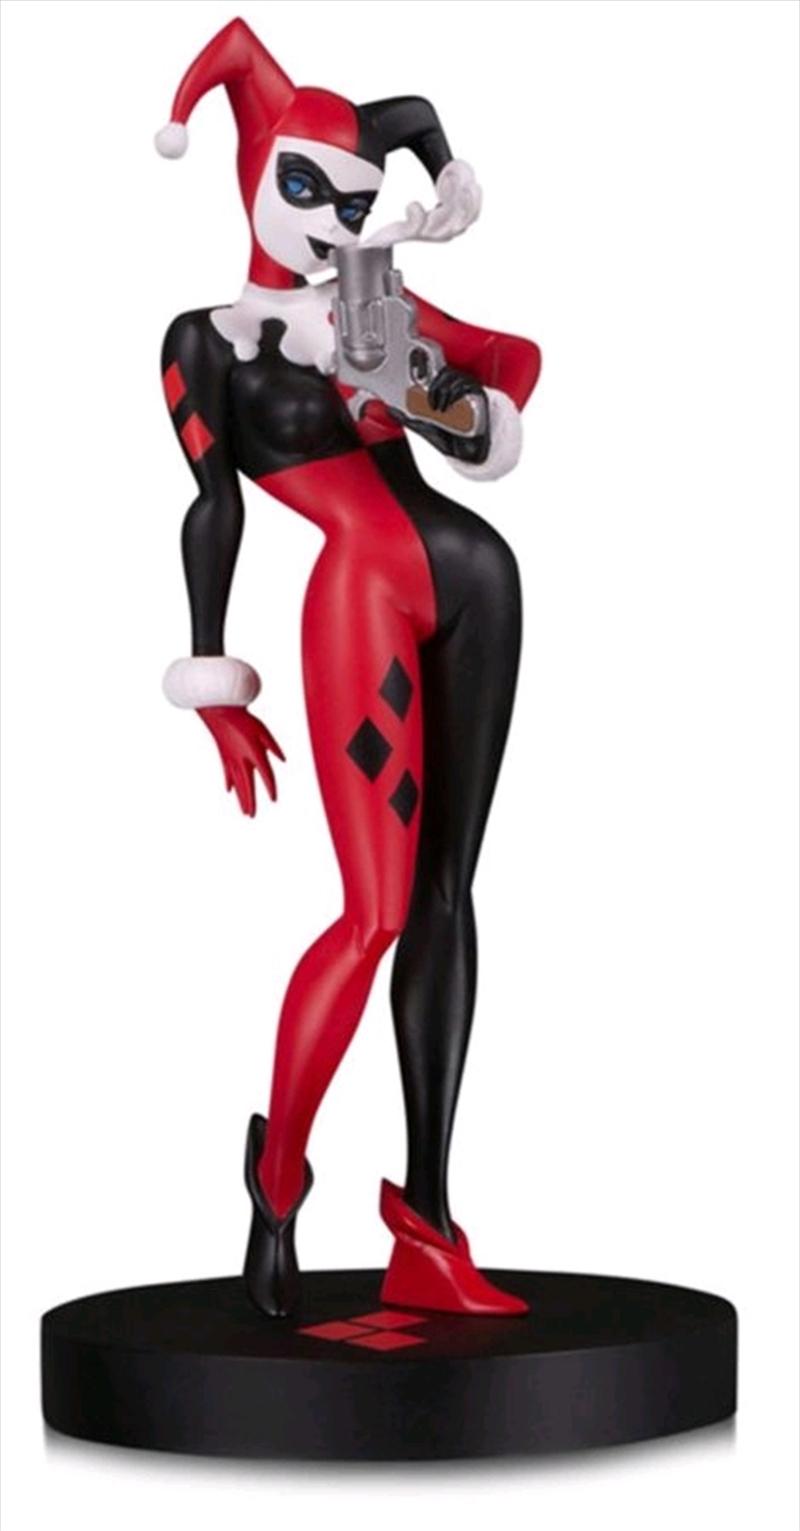 Batman - Harley Quinn by Bruce Timm Designer Mini Statue   Merchandise